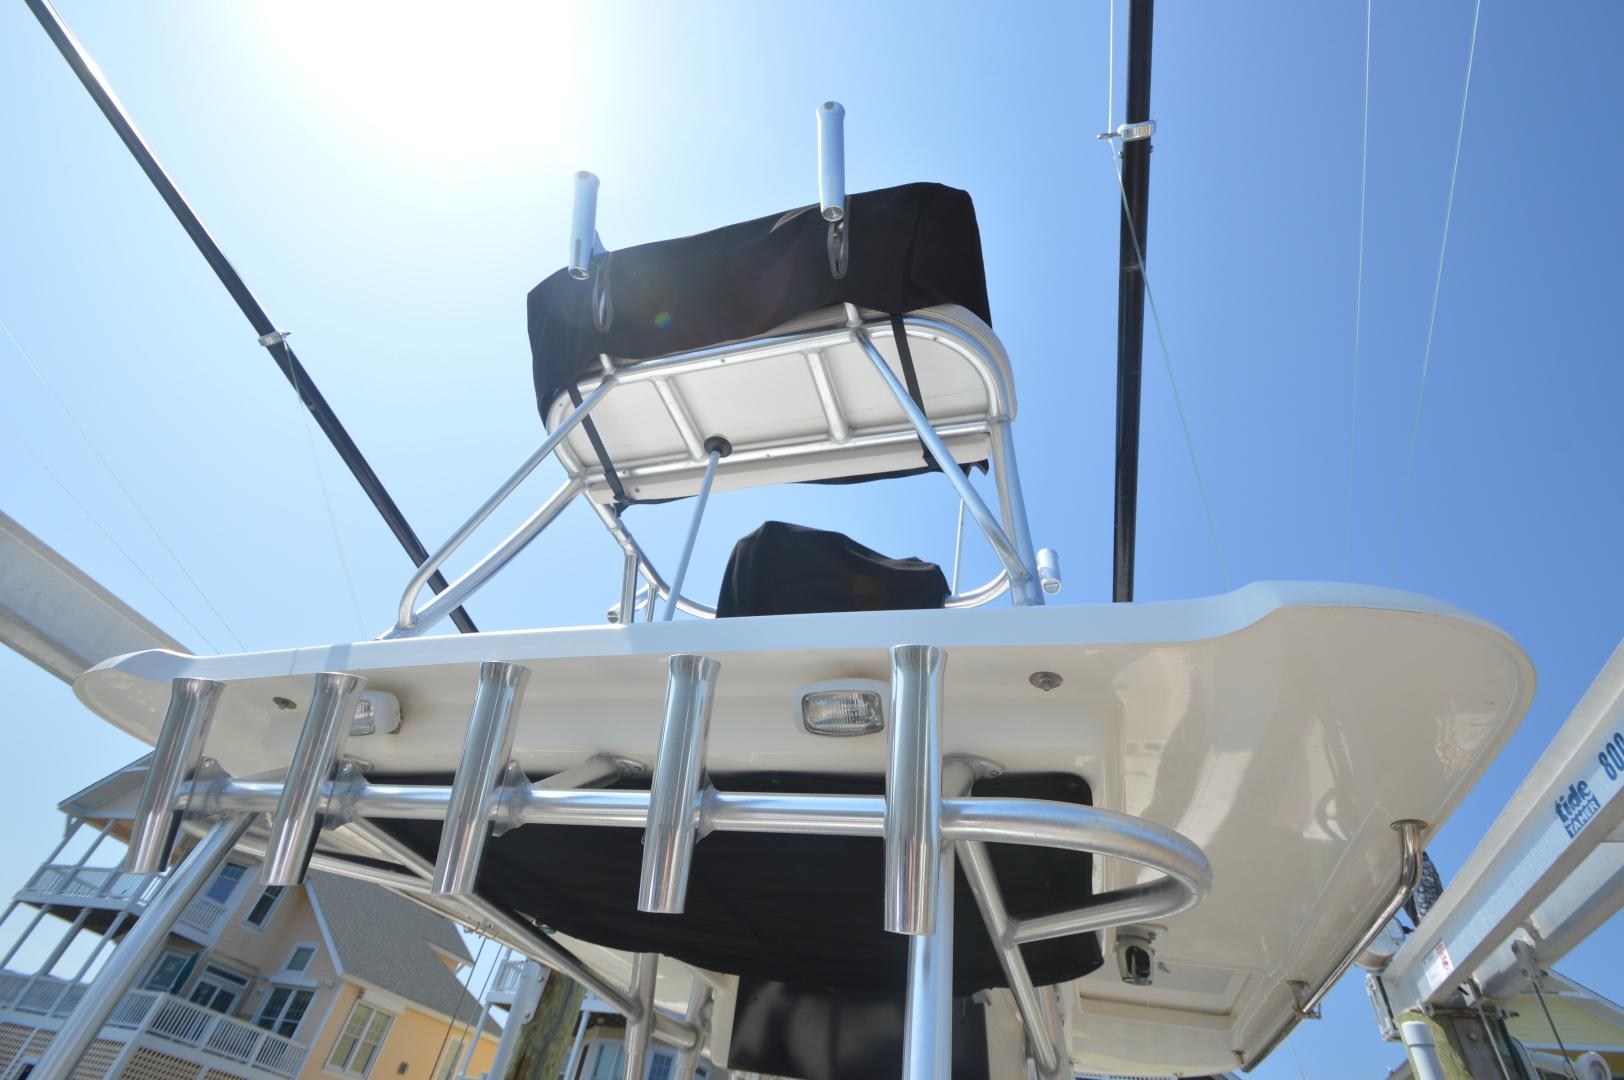 Boston Whaler-320 Outrage 2008 -Manteo-North Carolina-United States-1485485 | Thumbnail